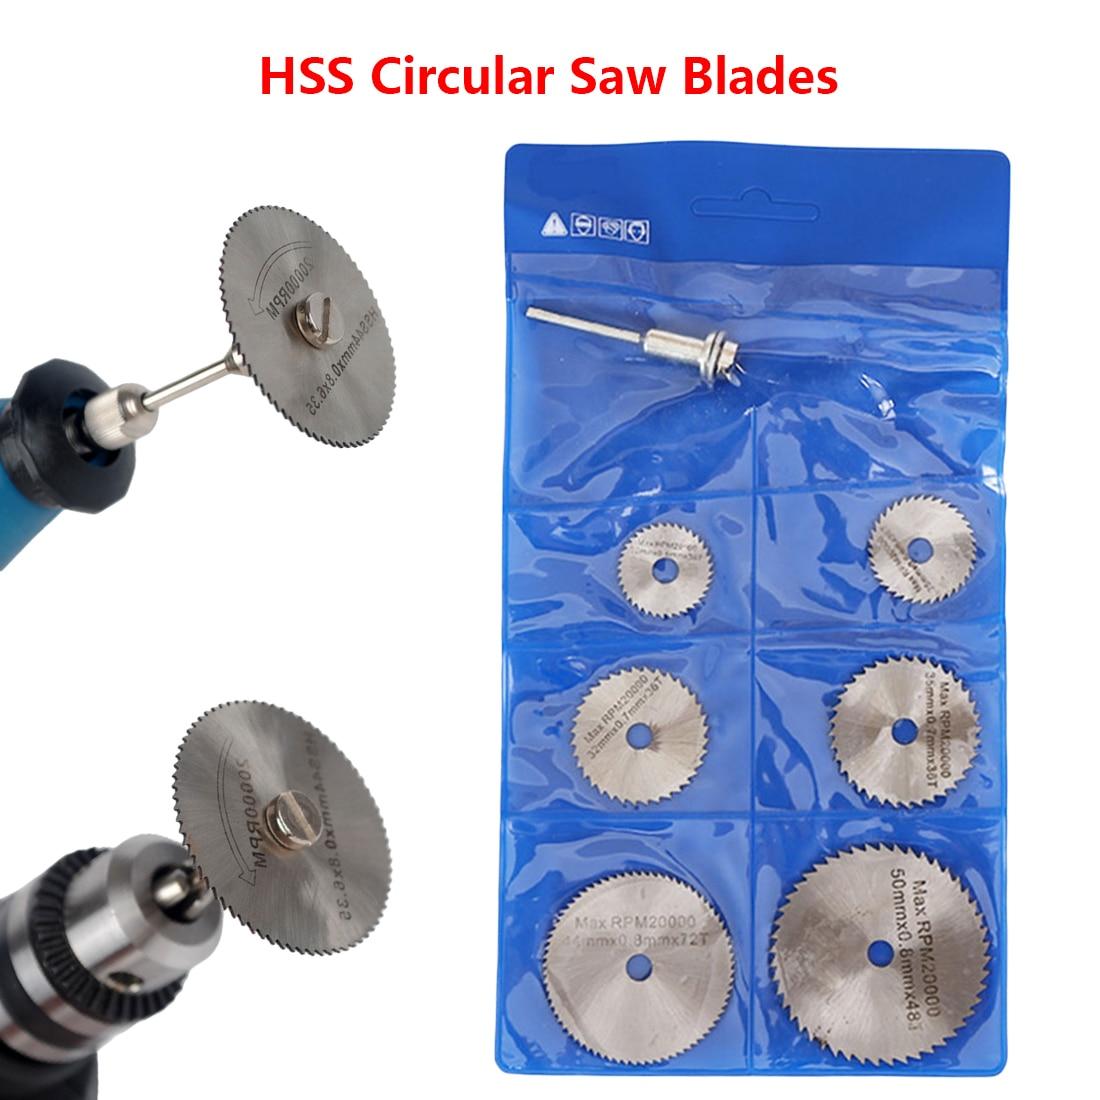 6Pcs Saw Blade +1pcs Mandrel HSS High-speed-steel Circular Rotary Blade Wheel Discs Mandrel For Dremel Tools Wood Cutting Saw